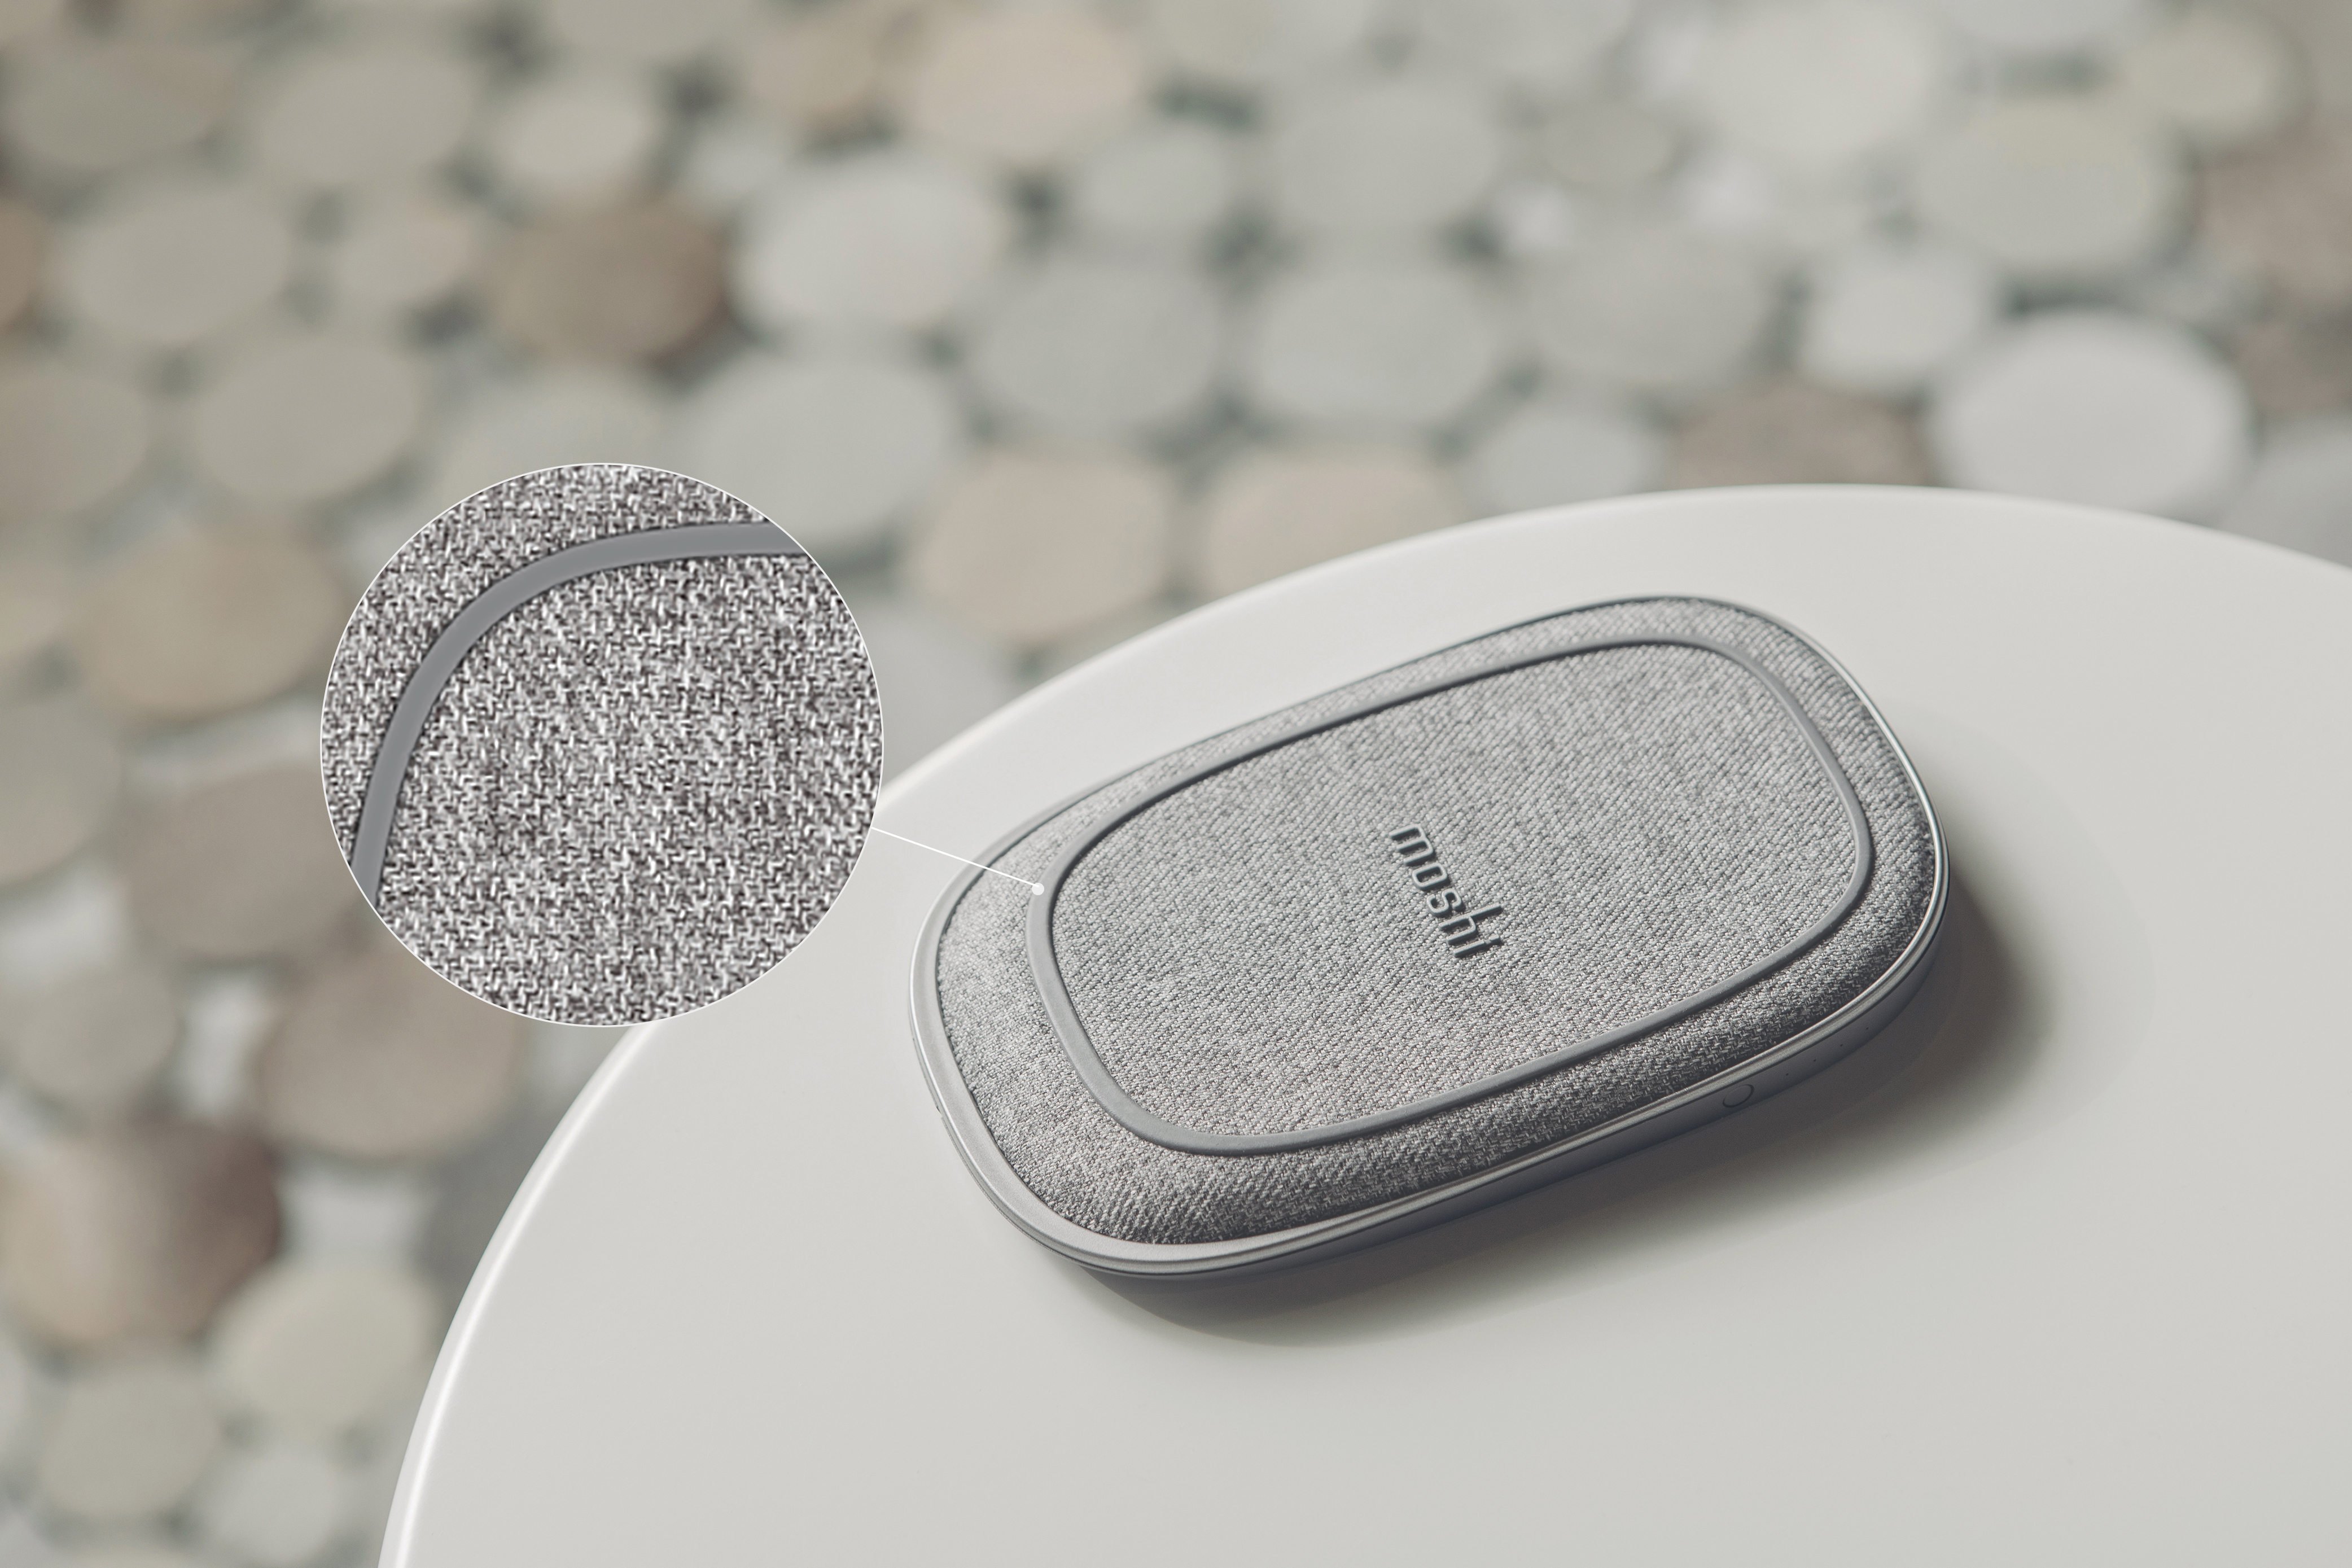 Porto Q 5K 採用柔軟的材質保護您的手機免於刮傷,表面和底座採防滑設計,有效防止手機滑動,保持穩定的充電質量。